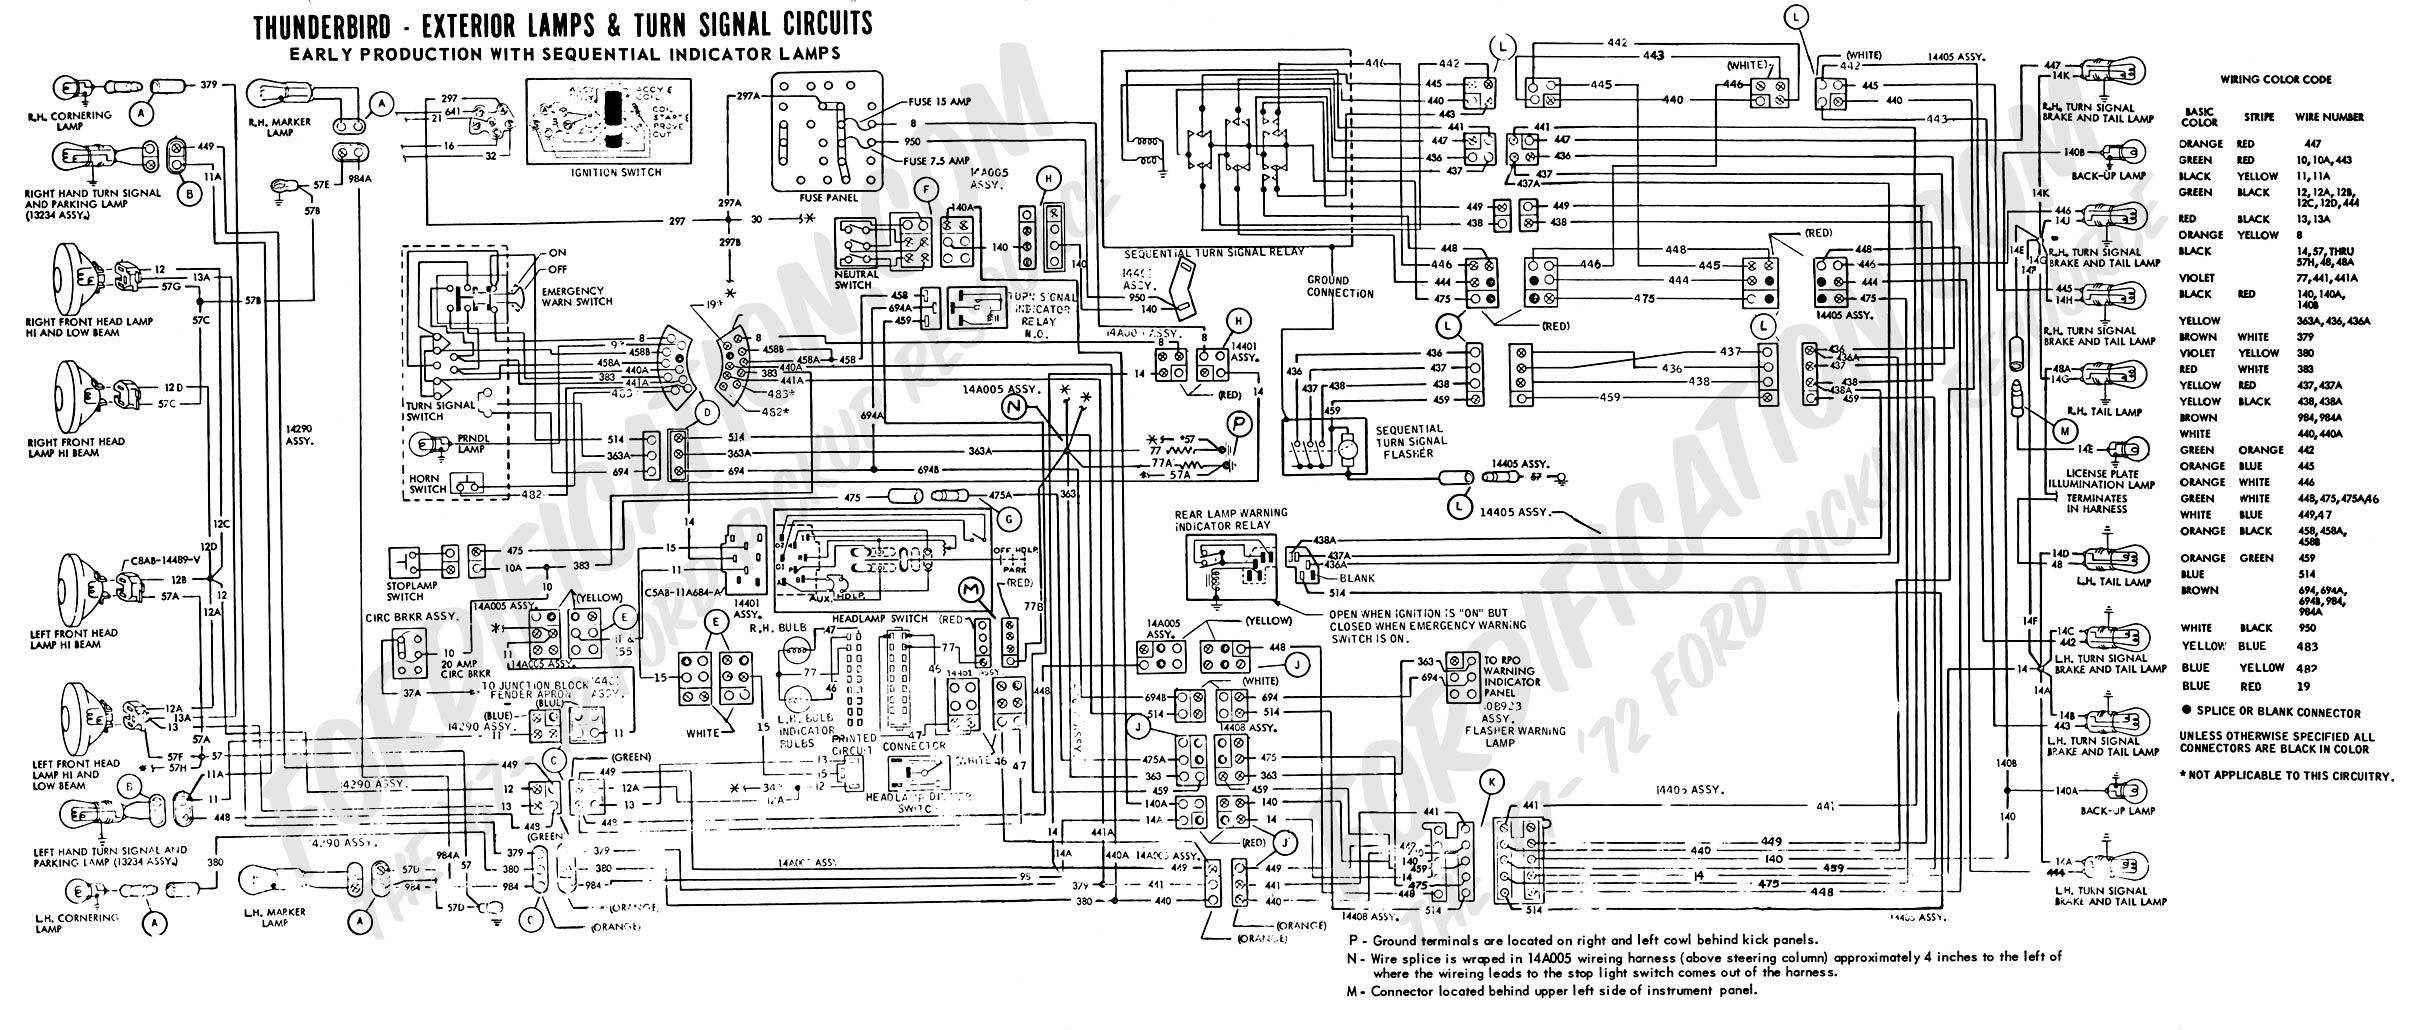 SO_9294] Seat Belt Warning Circuit Diagram Of 1967 1968 Thunderbird Wiring  DiagramPendu Xlexi Egre Hapolo Ical Intap Nuvit Xolia Inama Mohammedshrine Librar  Wiring 101